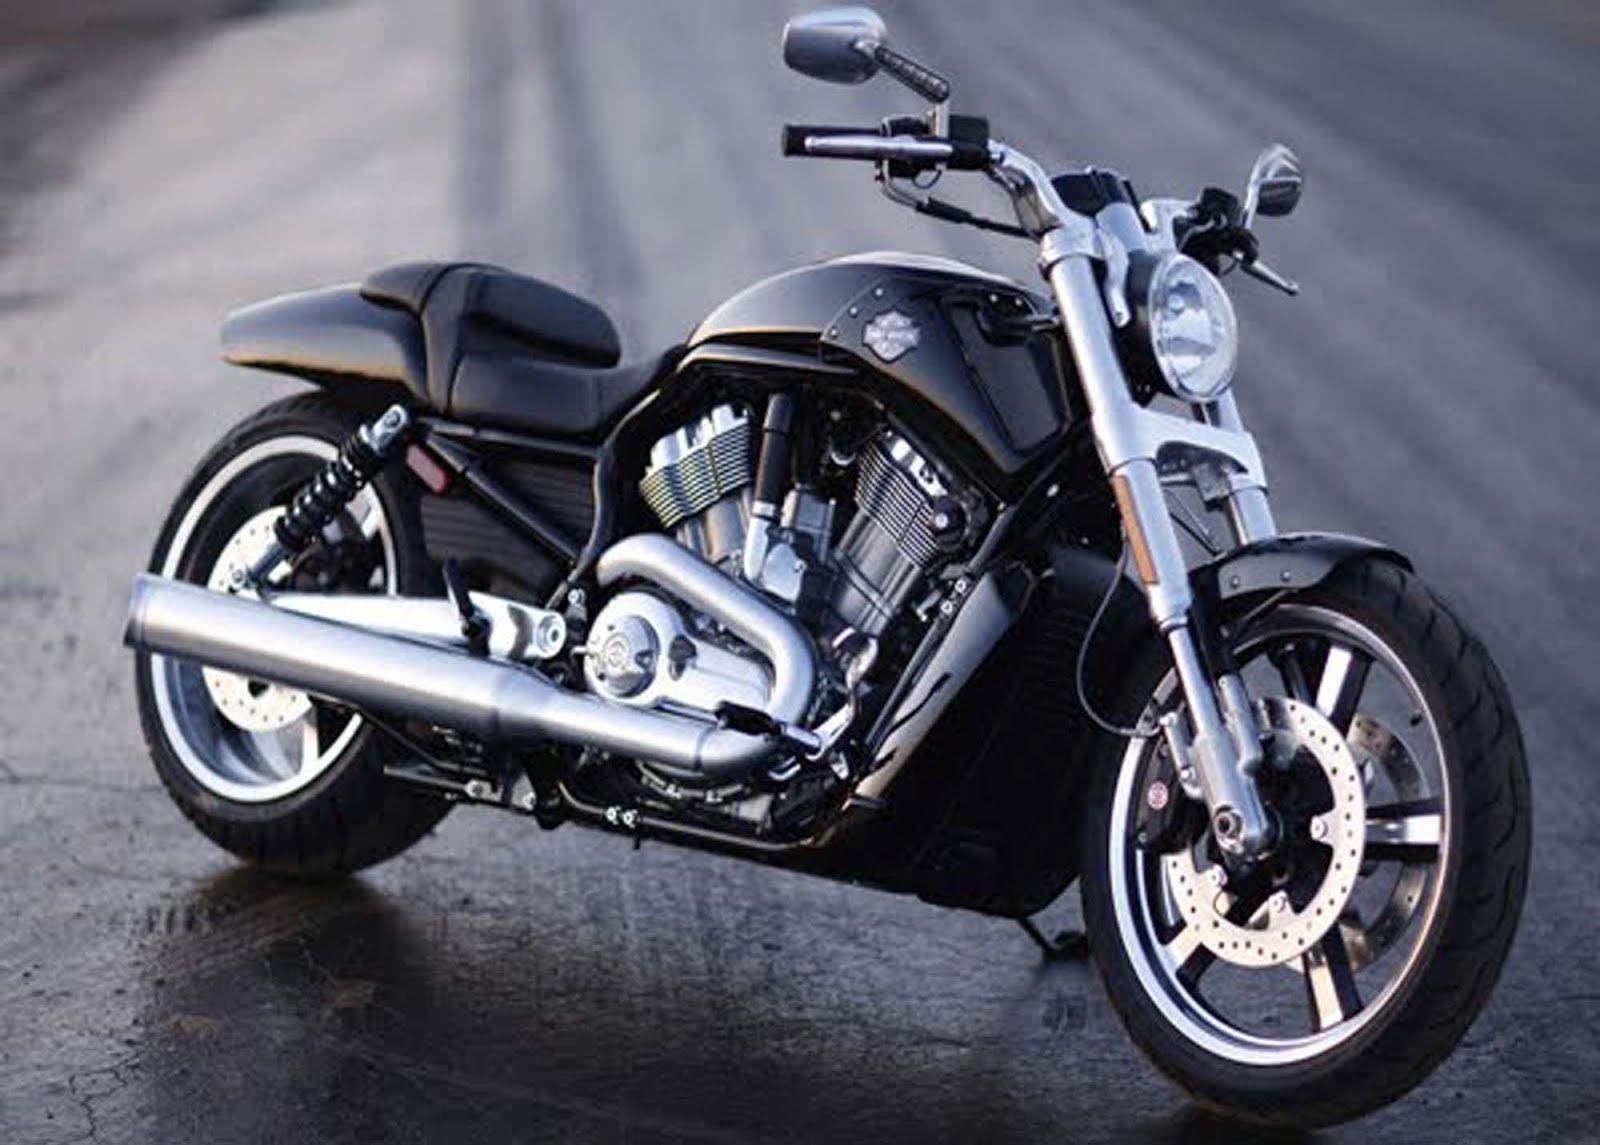 2013 Harley-Davidson VRSCF V-Rod   Harley Davidson   Pinterest ...